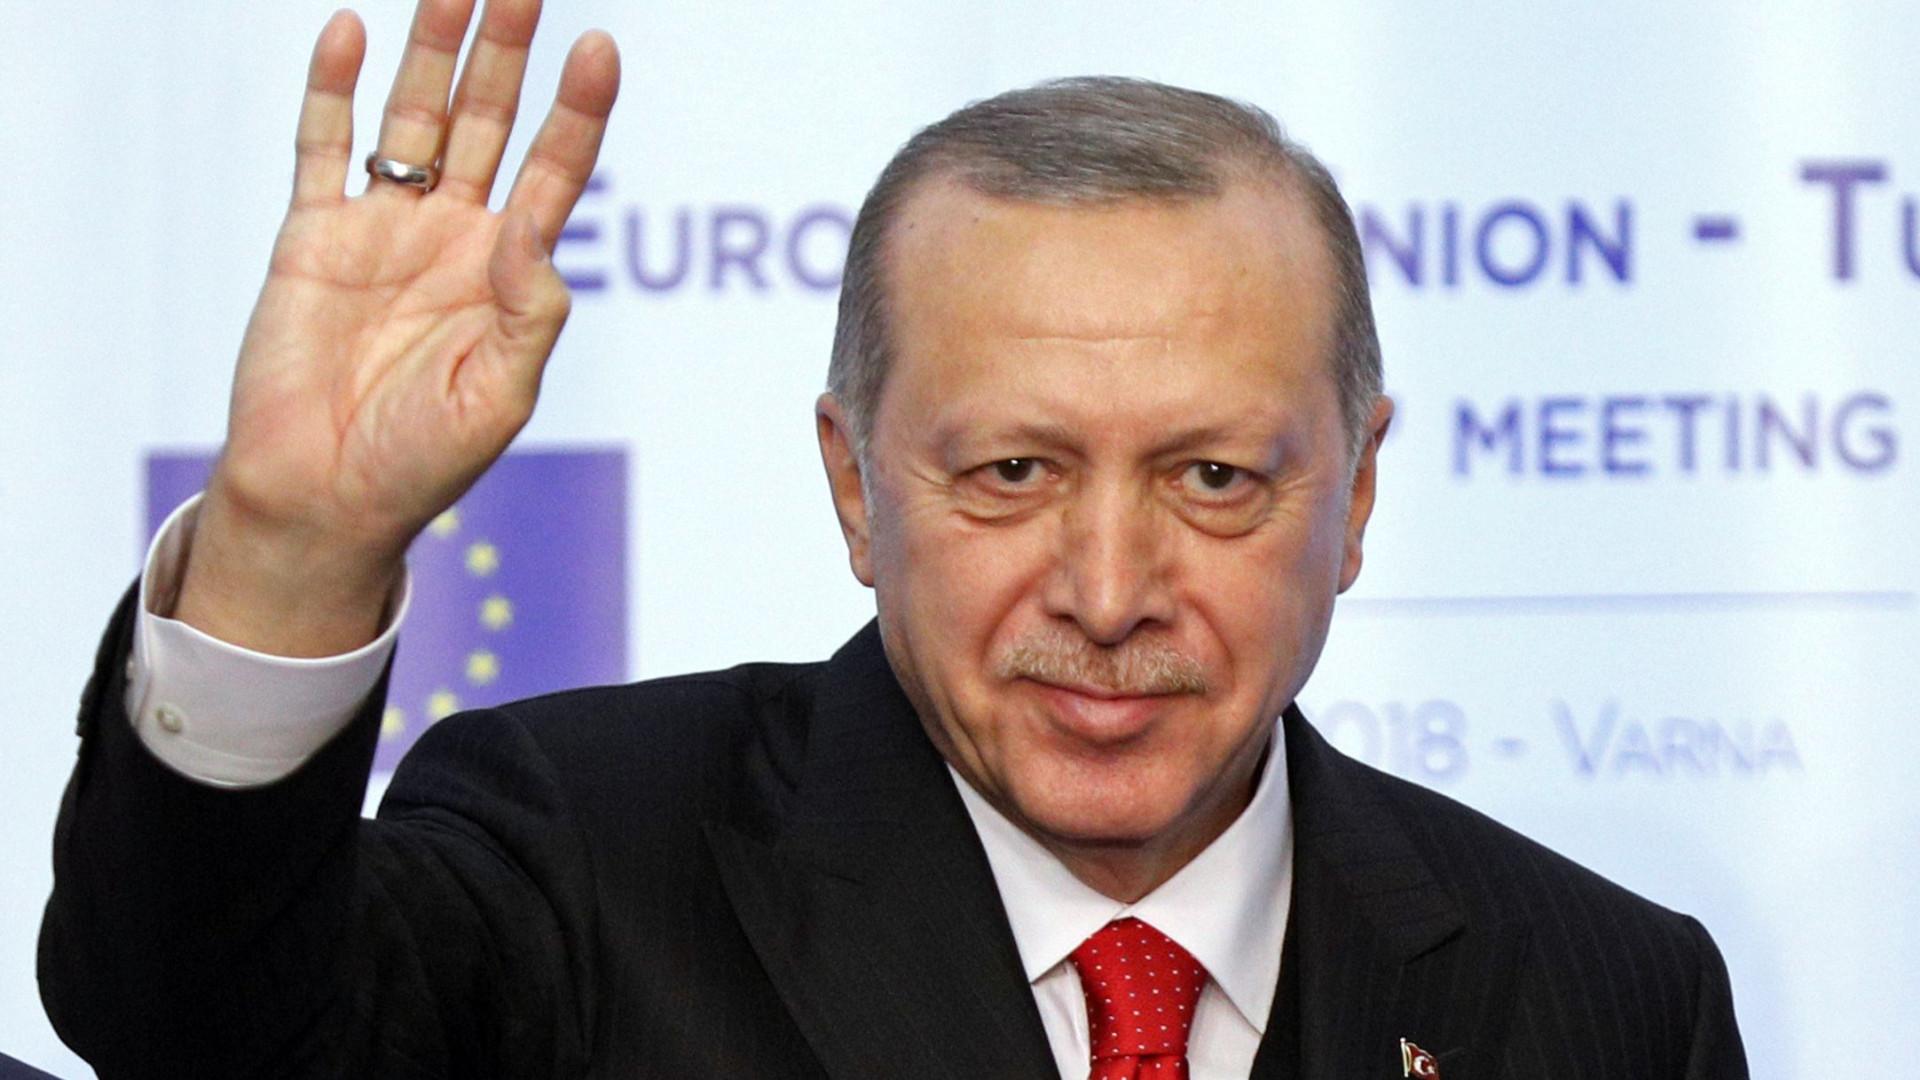 Turquia acusa Israel de terrorismo de Estado e genocídio